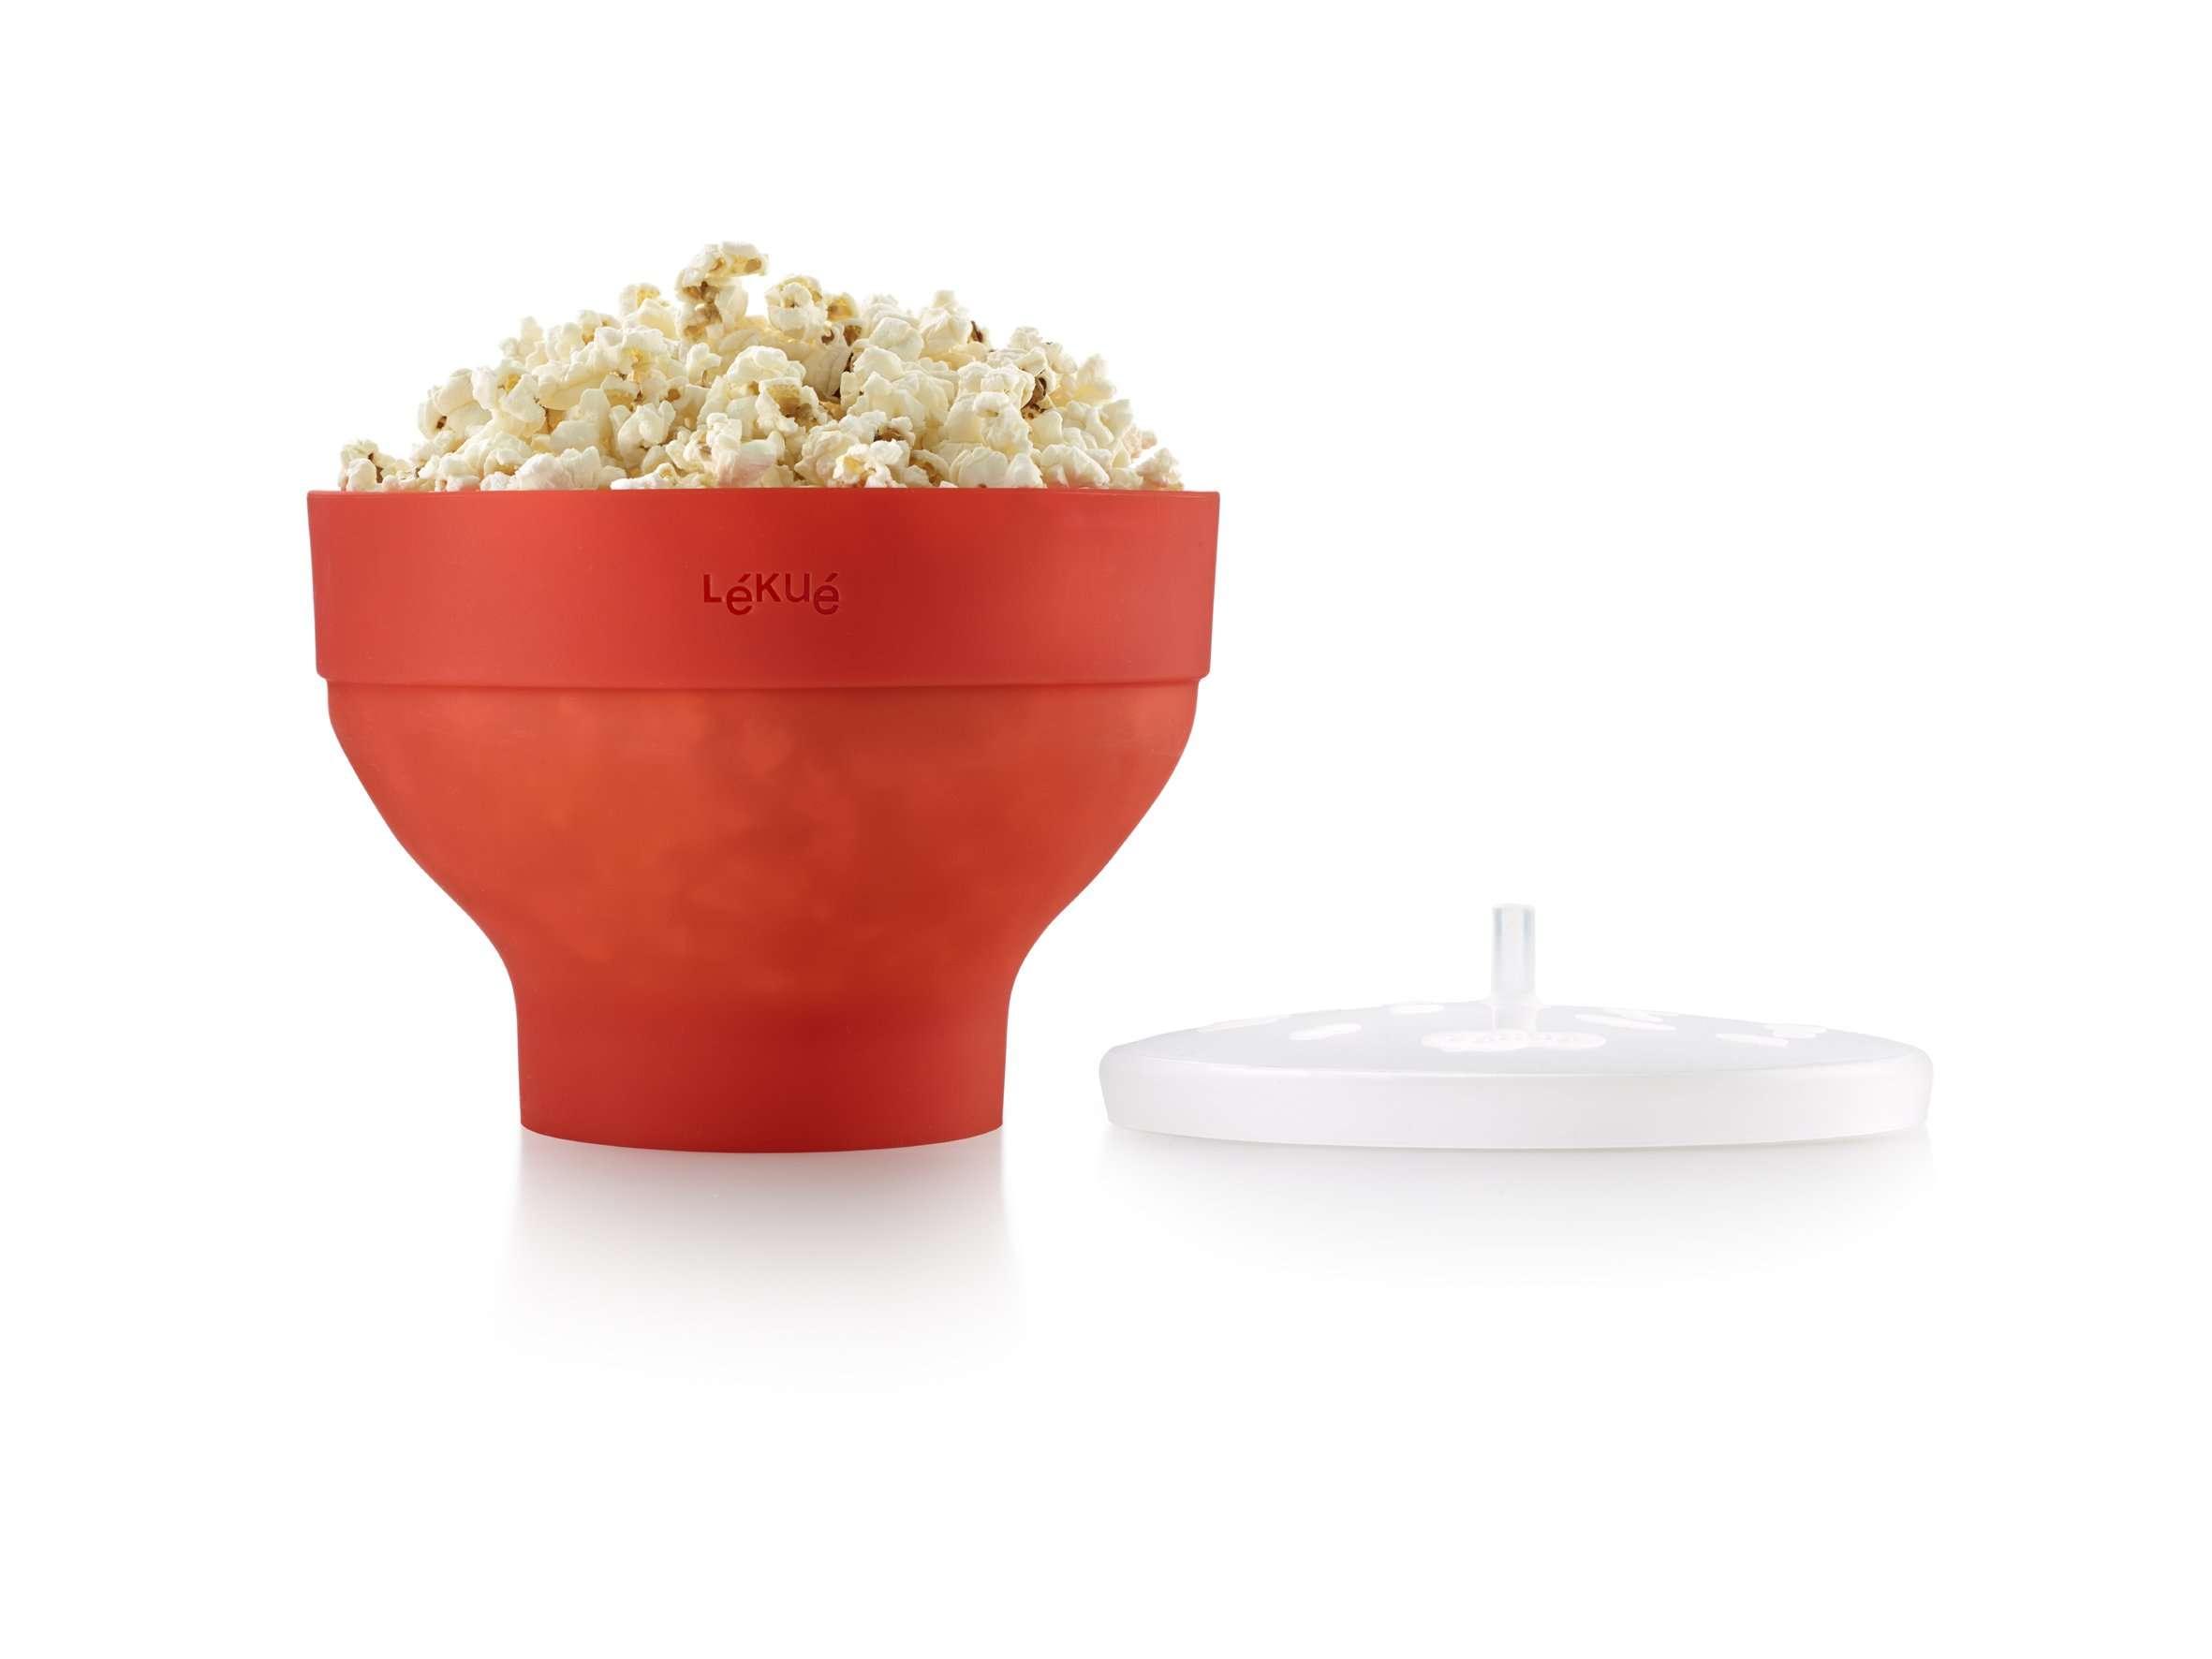 micropopcorn i kastrull